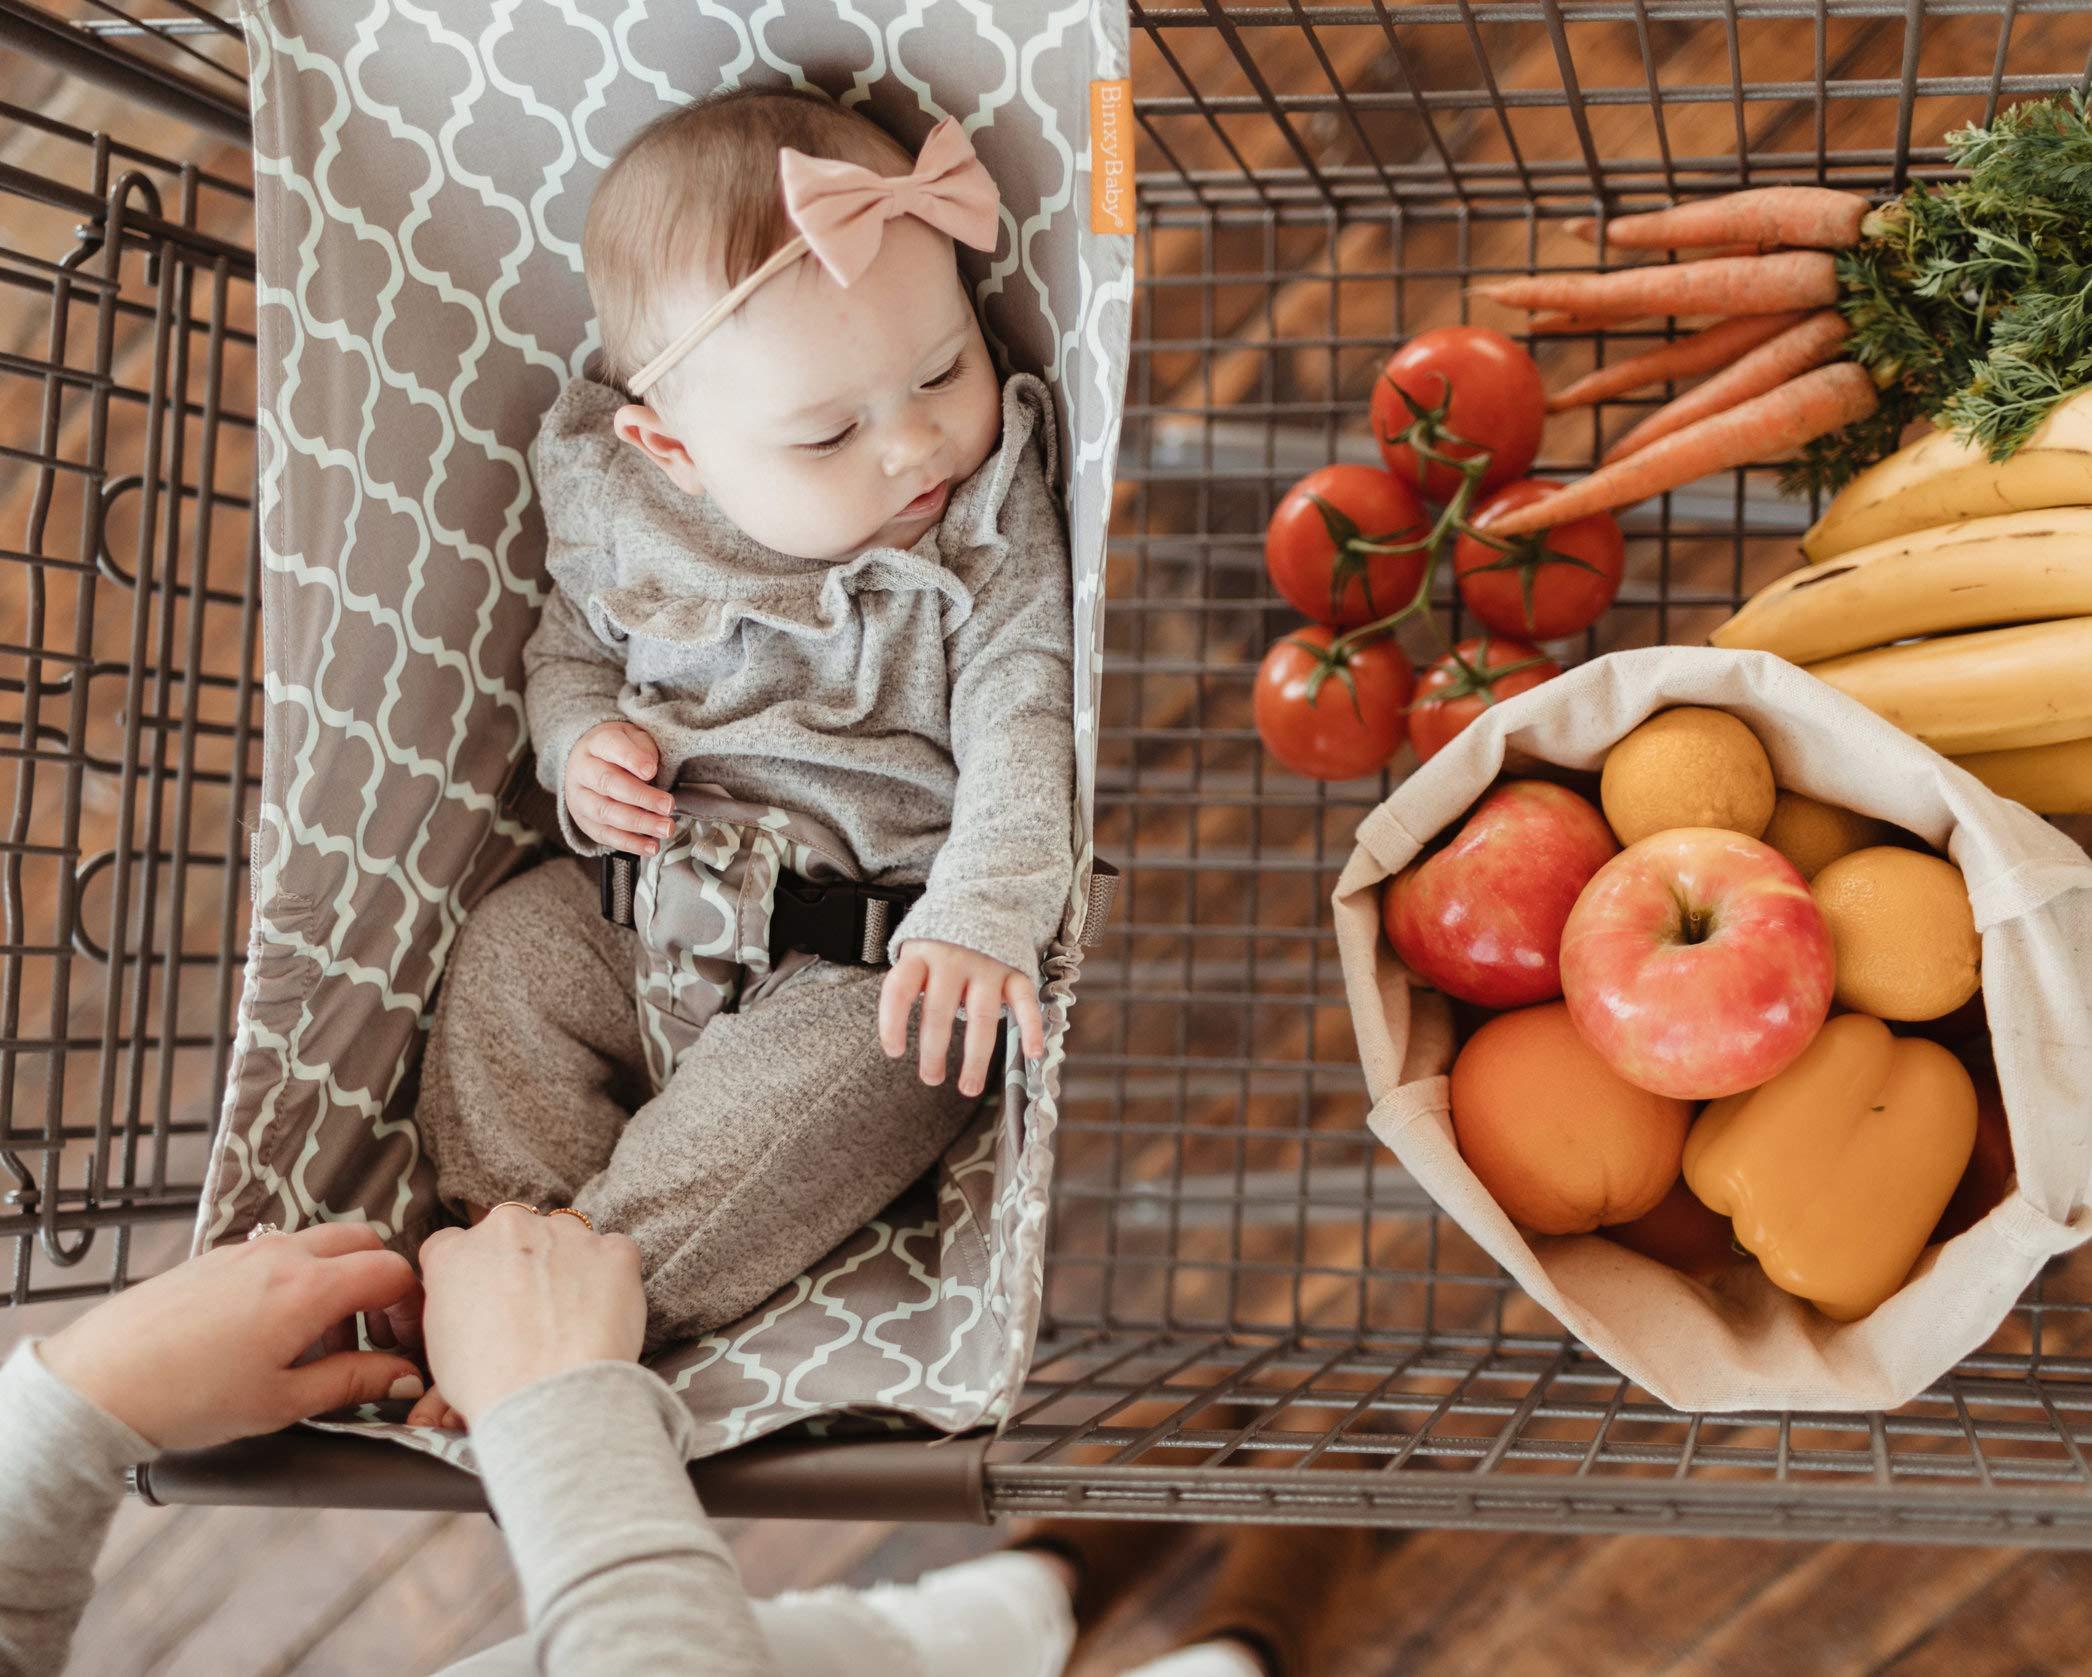 BINXY BABY Shopping Cart Hammock | The Original | Ergonomic Infant Carrier + Positioner by Binxy Baby (Image #3)